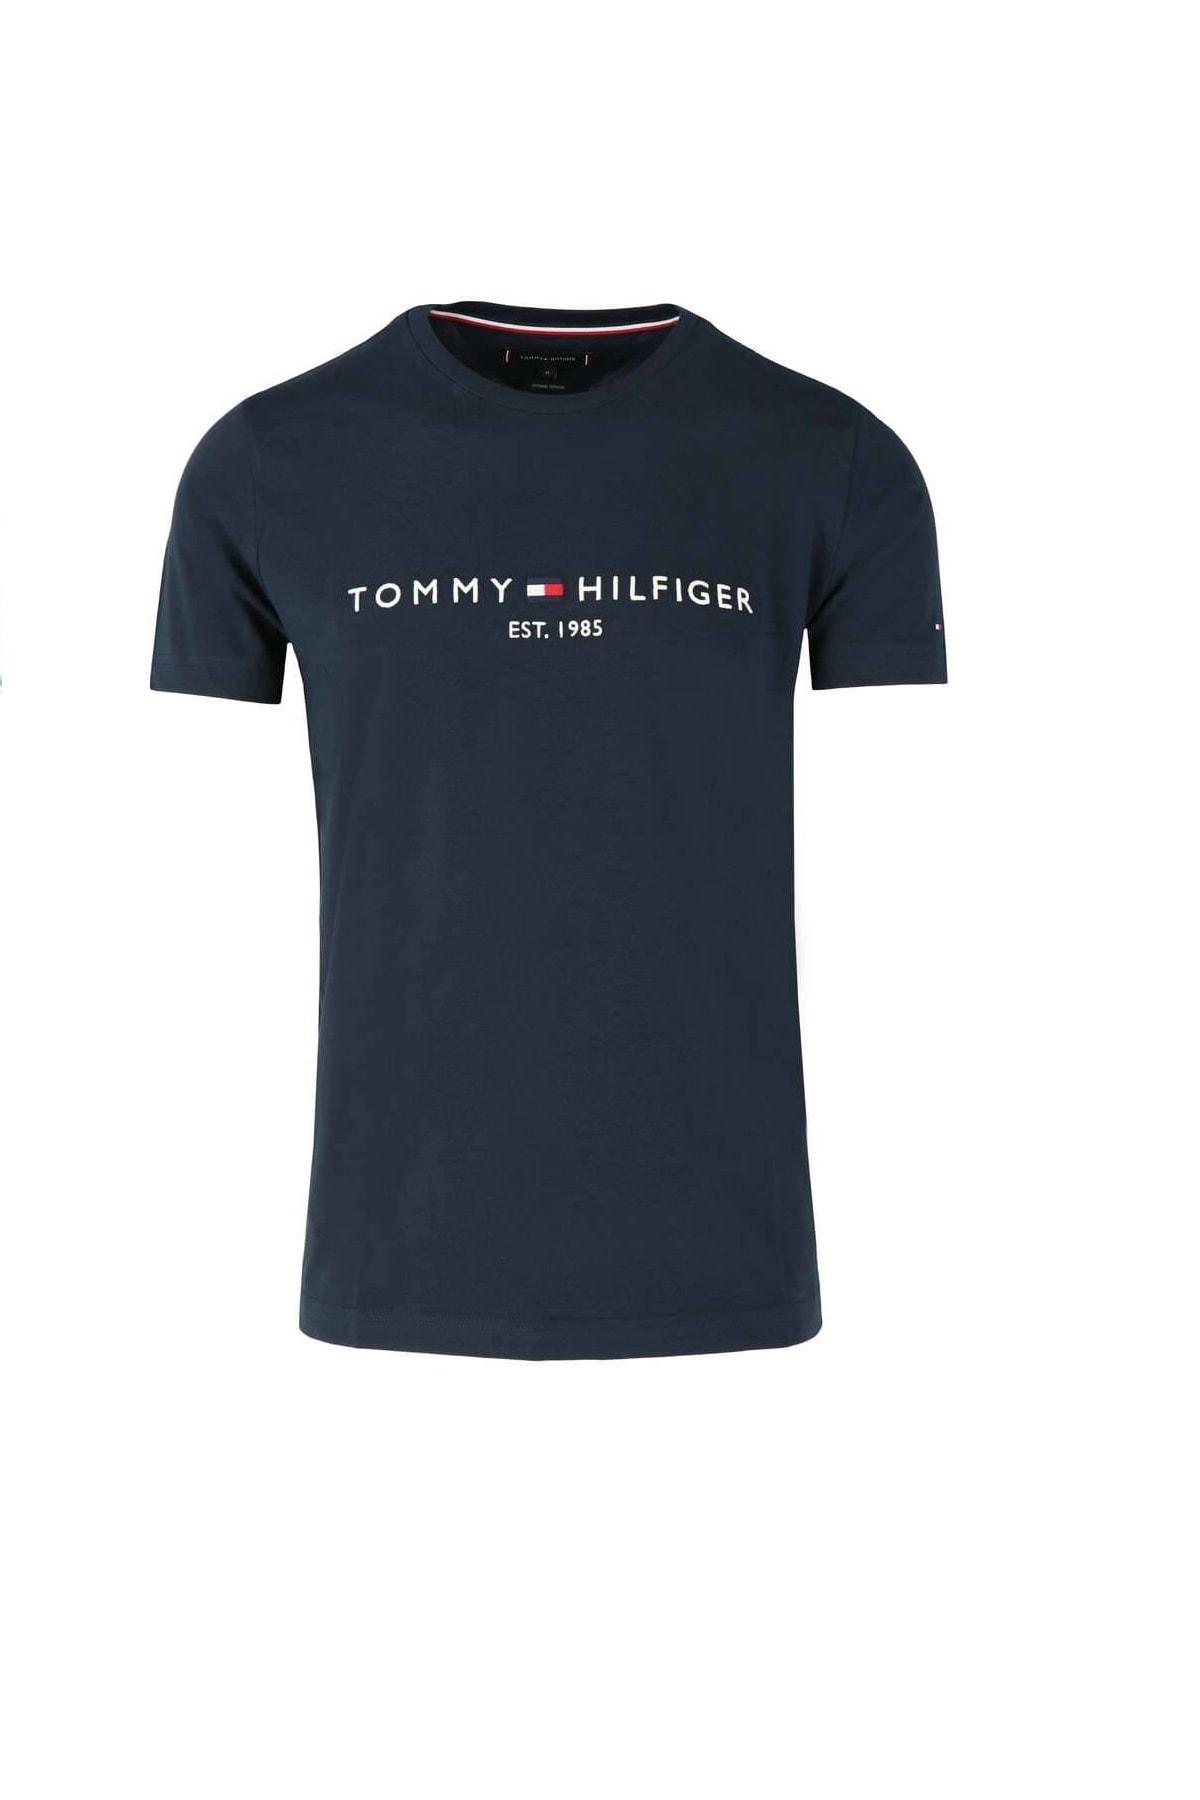 Tommy Hilfiger Erkek Lacivert  Logo Tee T-shirt Mw0mw11797 1